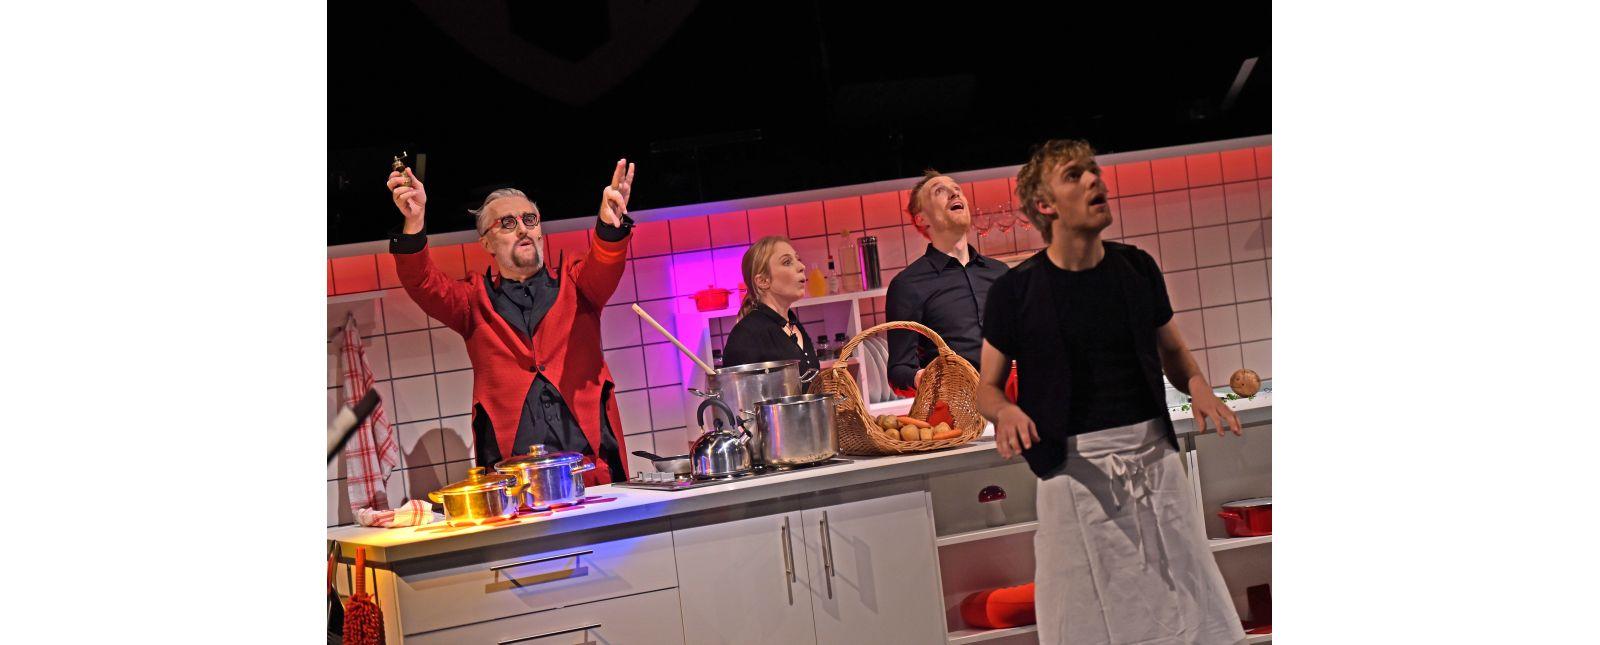 Teufels Küche // Klaus Simon, Mariella Bachmann, Philipp Schiemenz, Justin Auer  2017 // Foto: Maurice Korbel